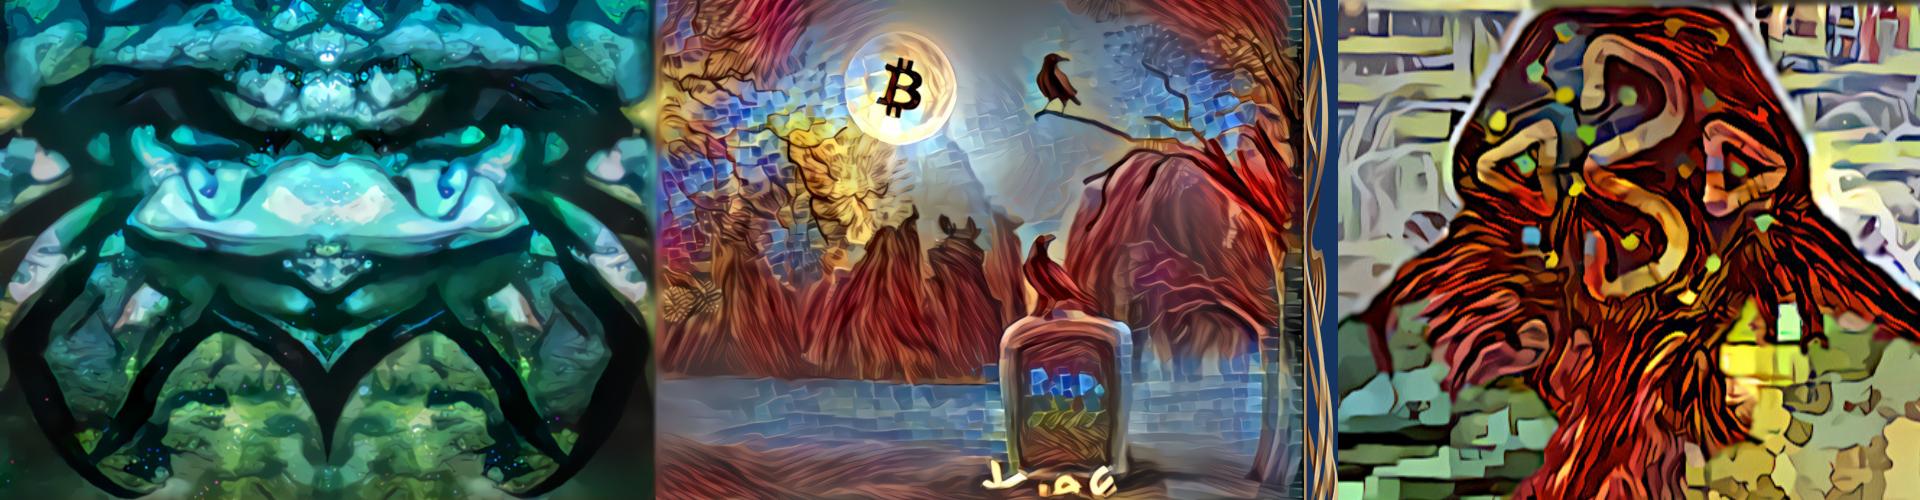 Cryptoart walkthroughs